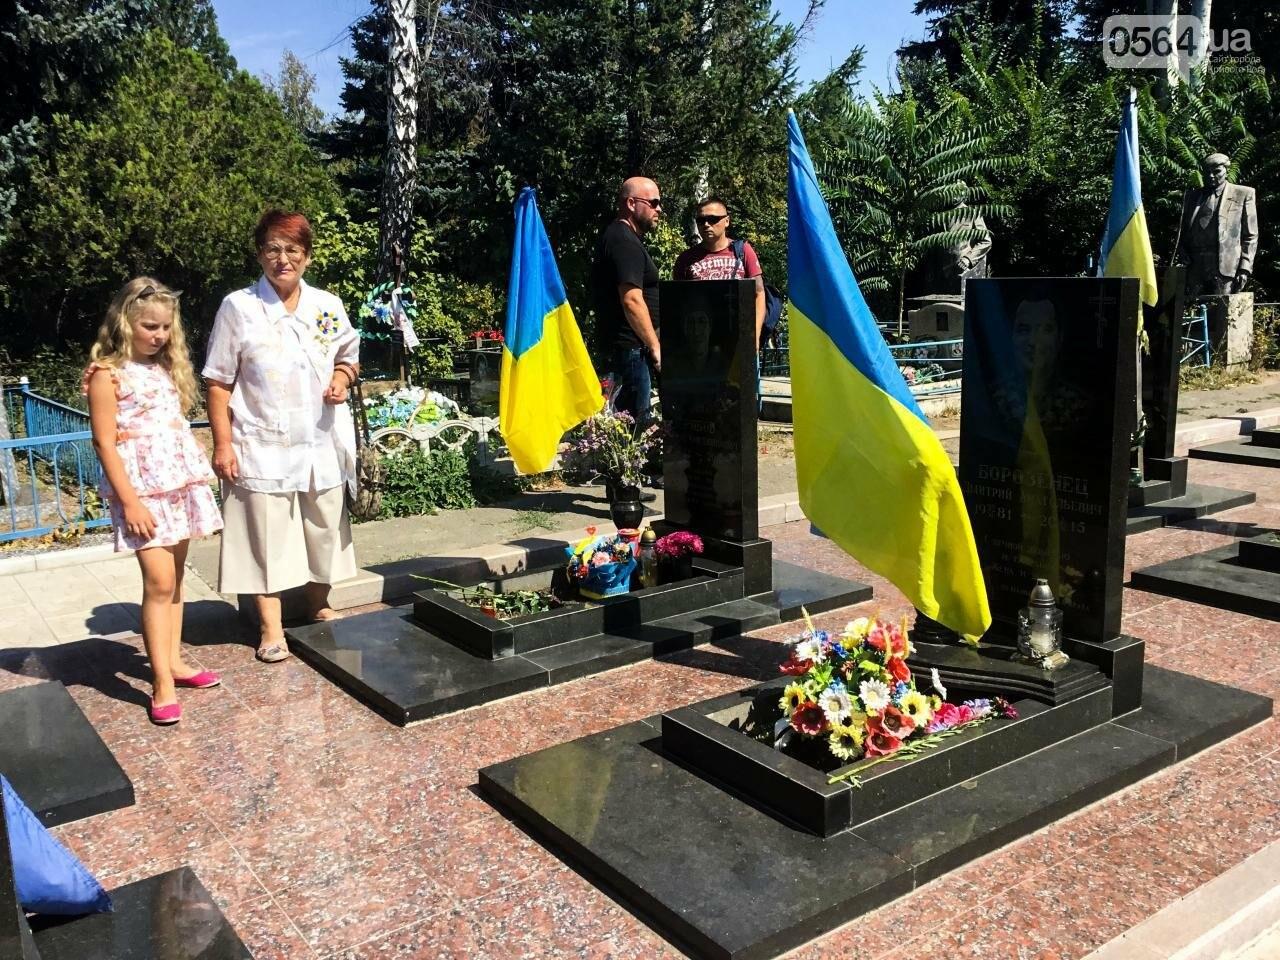 На Аллее Героев провели панихиду по погибшим в зоне АТО криворожанам, - ФОТО , фото-36